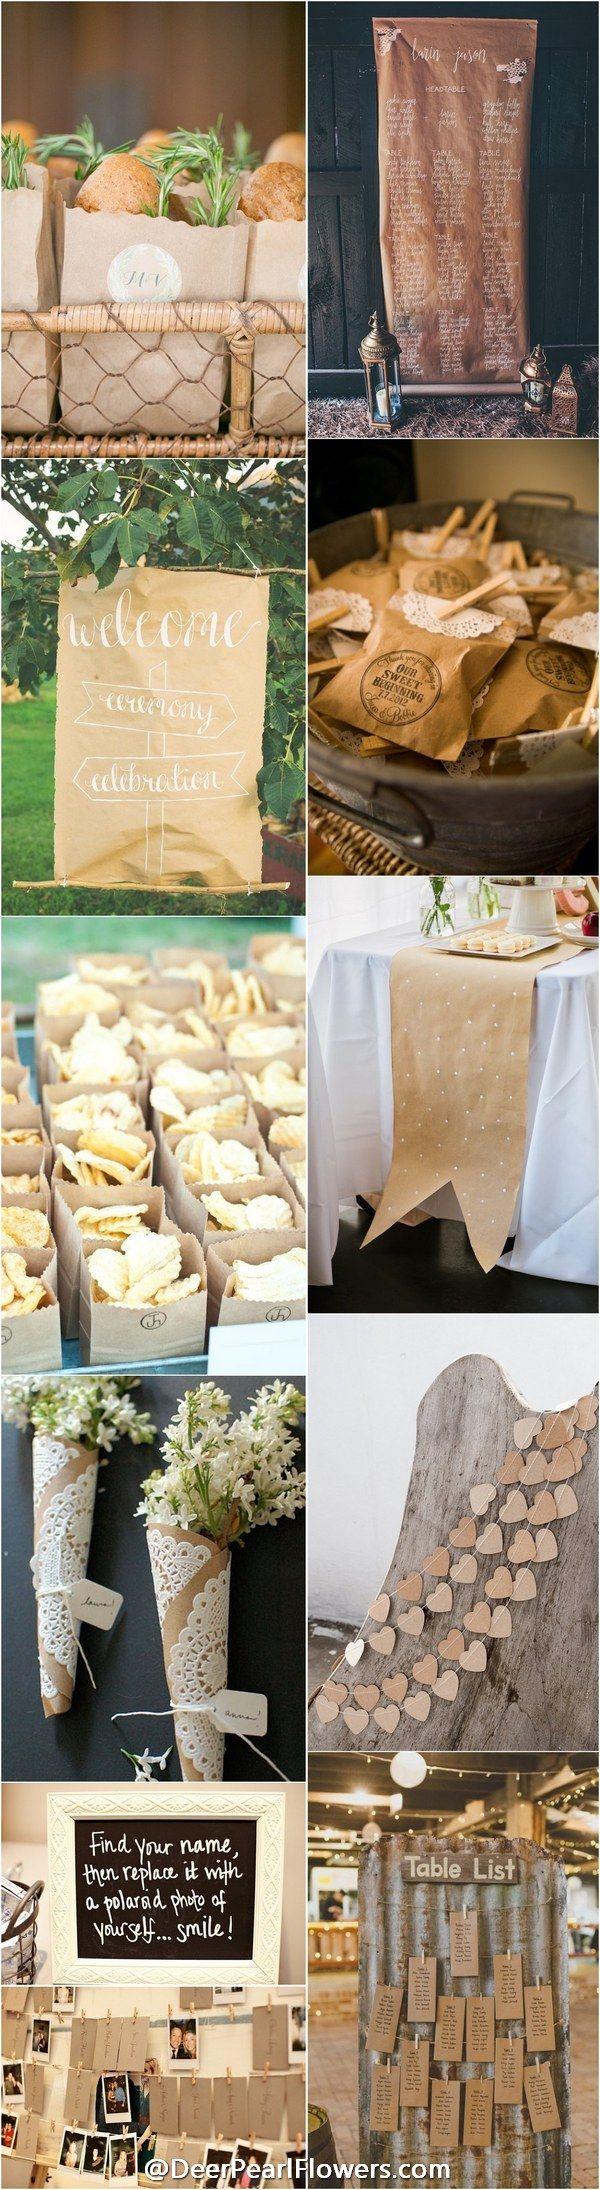 Kraft Paper rustic country wedding ideas / http://www.deerpearlflowers.com/rustic-country-kraft-paper-wedding-ideas/